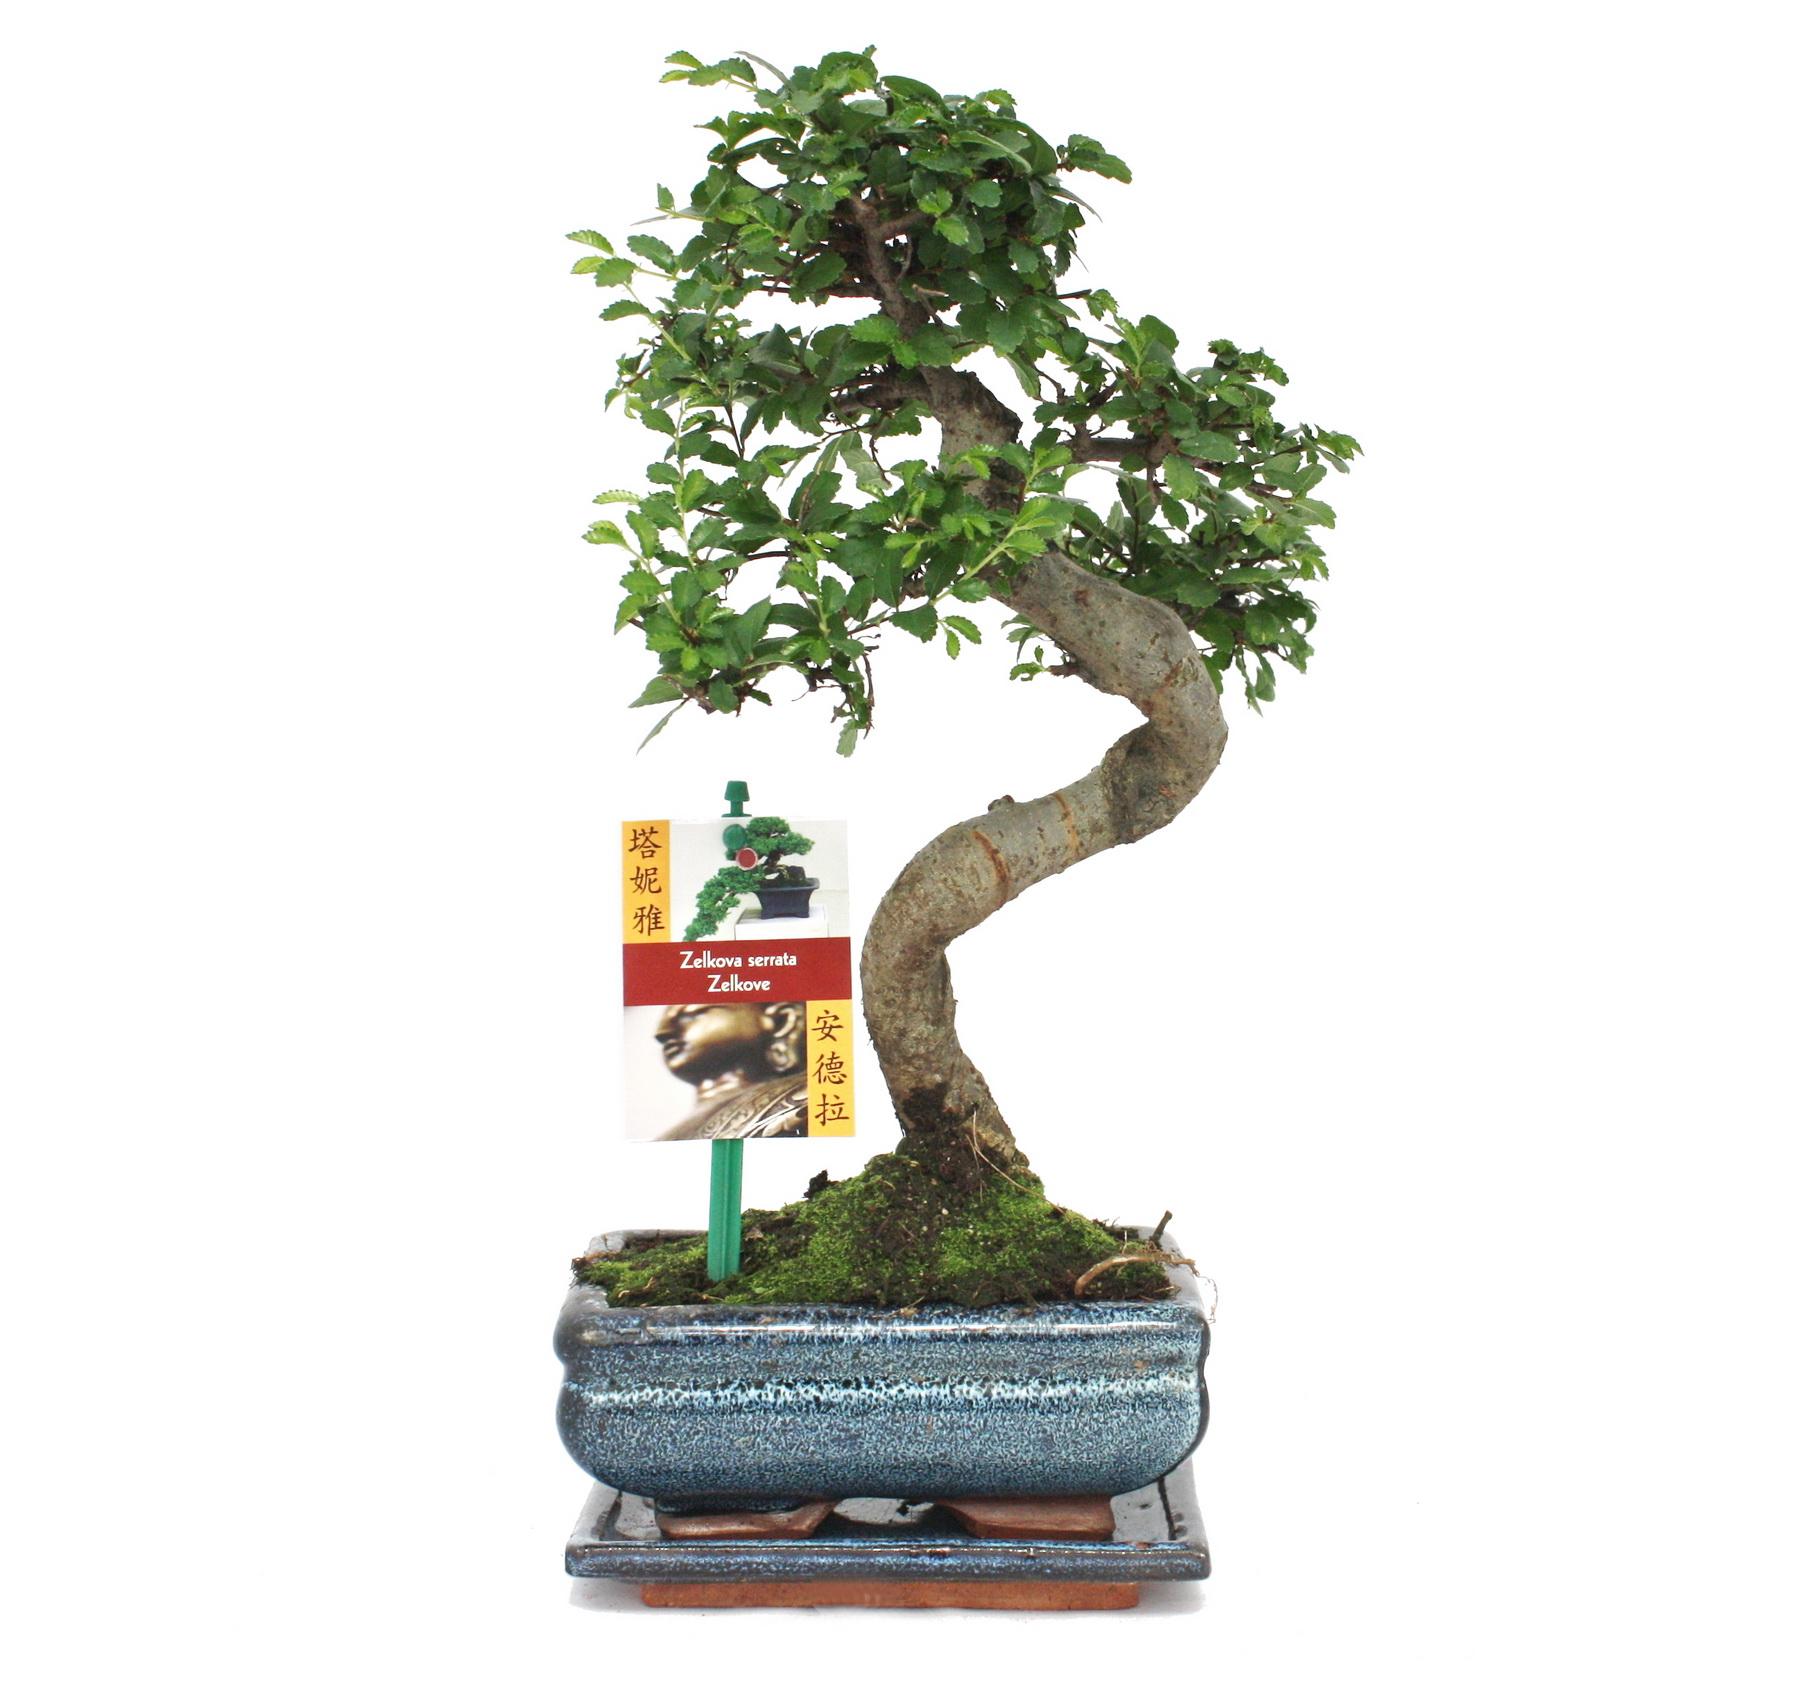 bonsai chinesische ulme ulmus parviflora ca 6 jahre. Black Bedroom Furniture Sets. Home Design Ideas